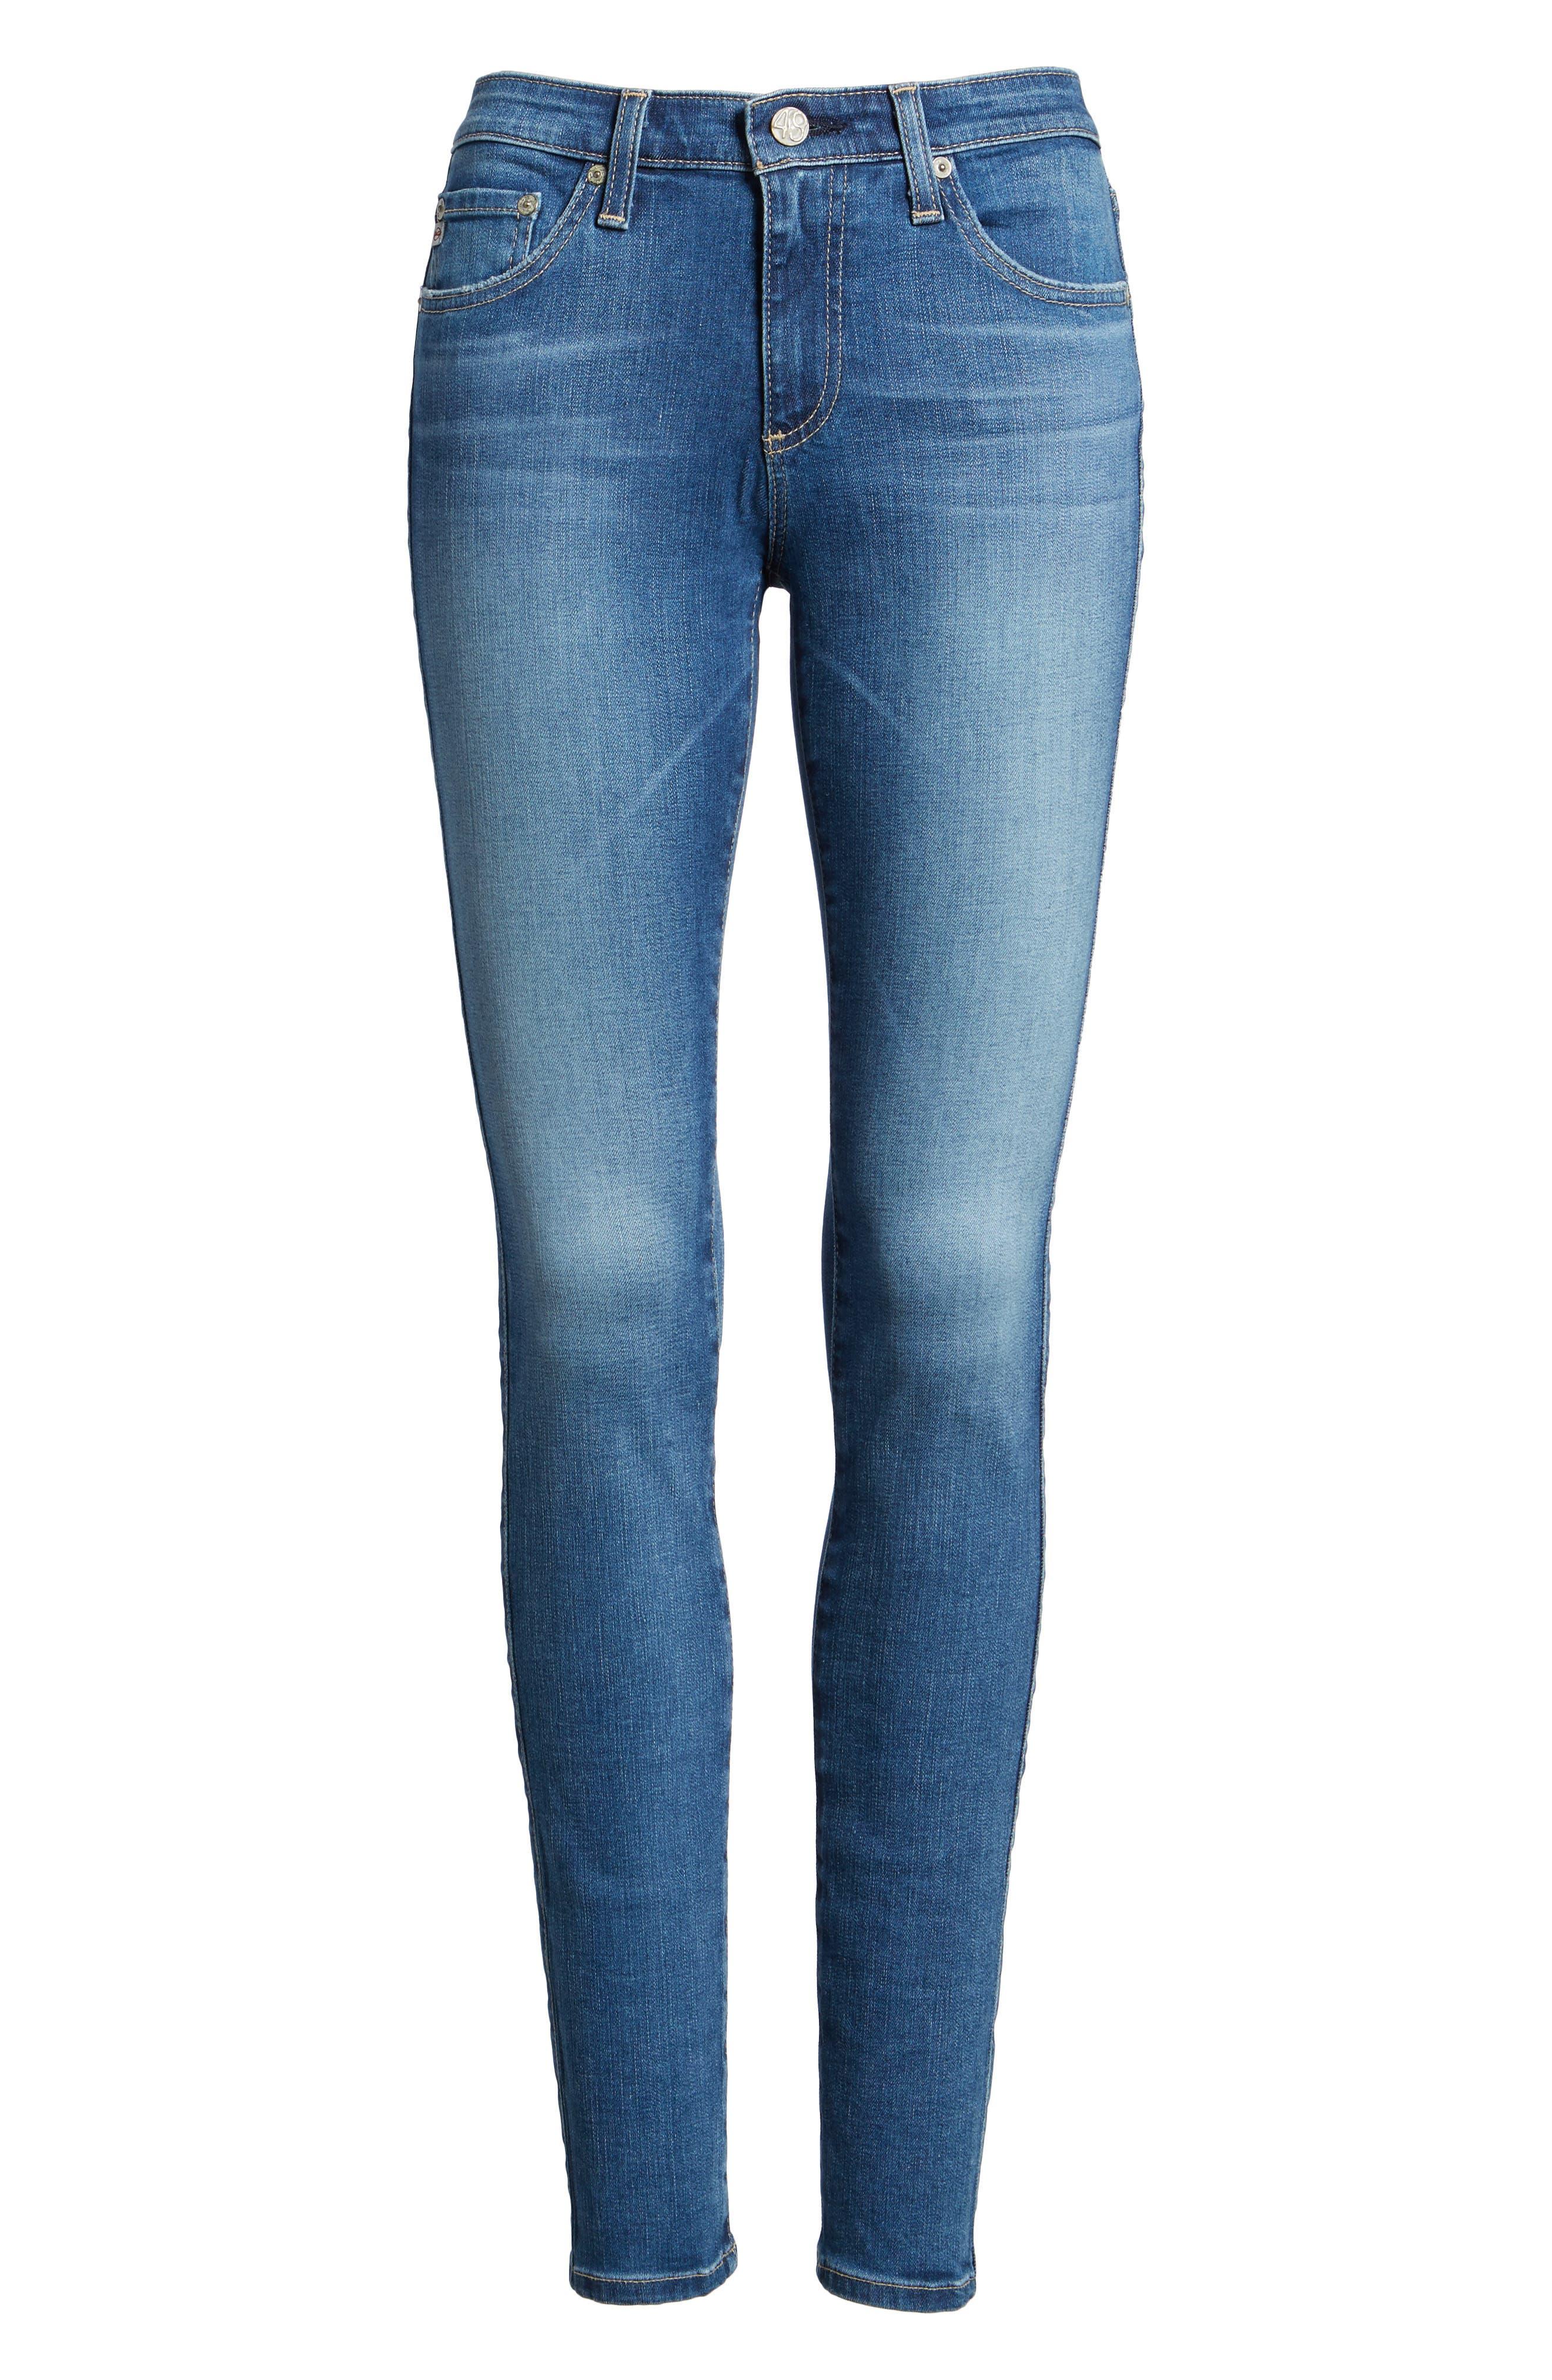 'The Legging' Super Skinny Jeans,                             Alternate thumbnail 58, color,